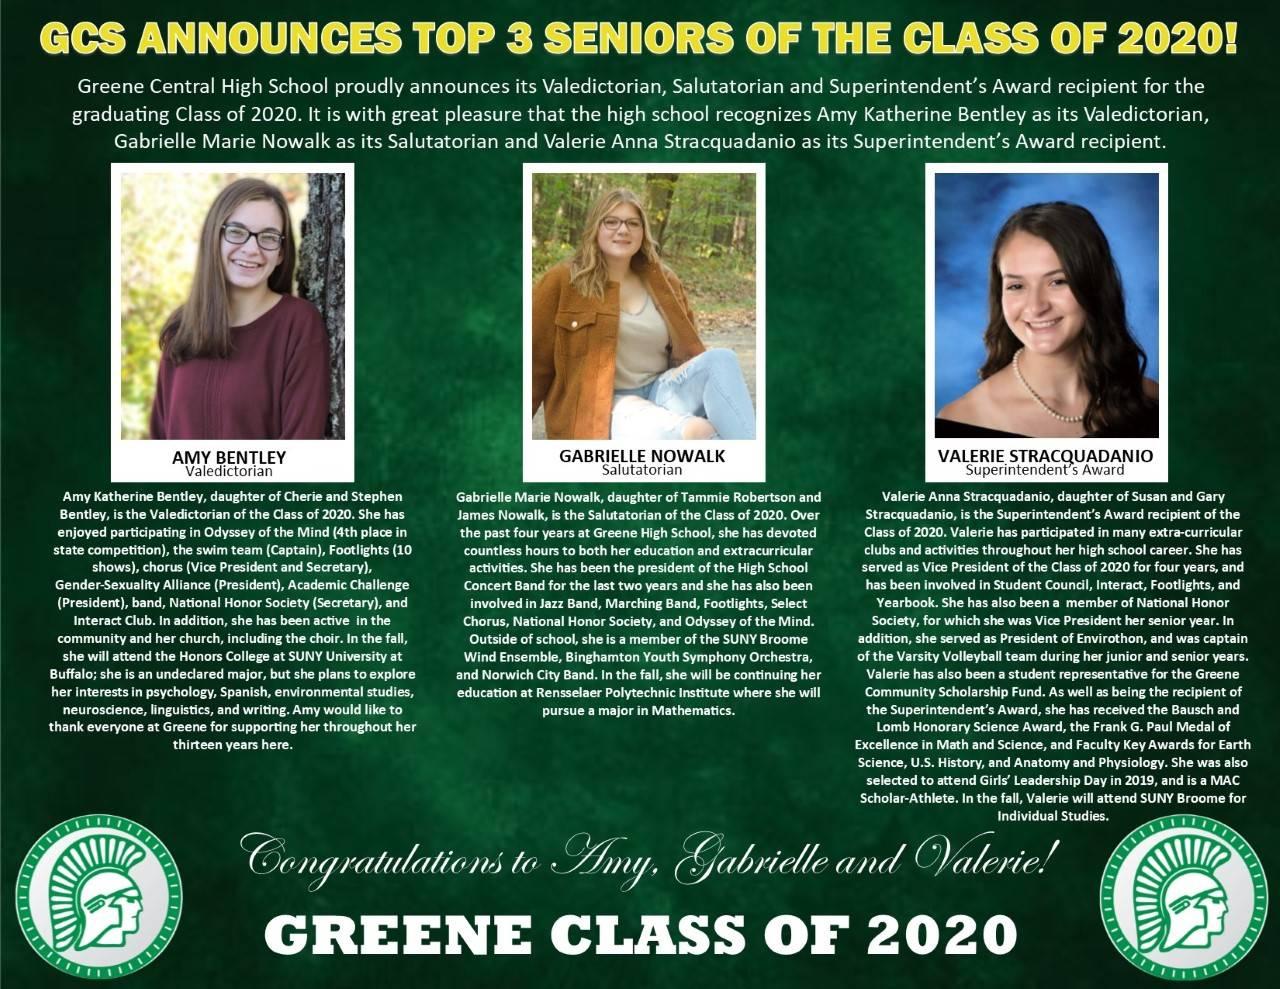 Top 3 Seniors